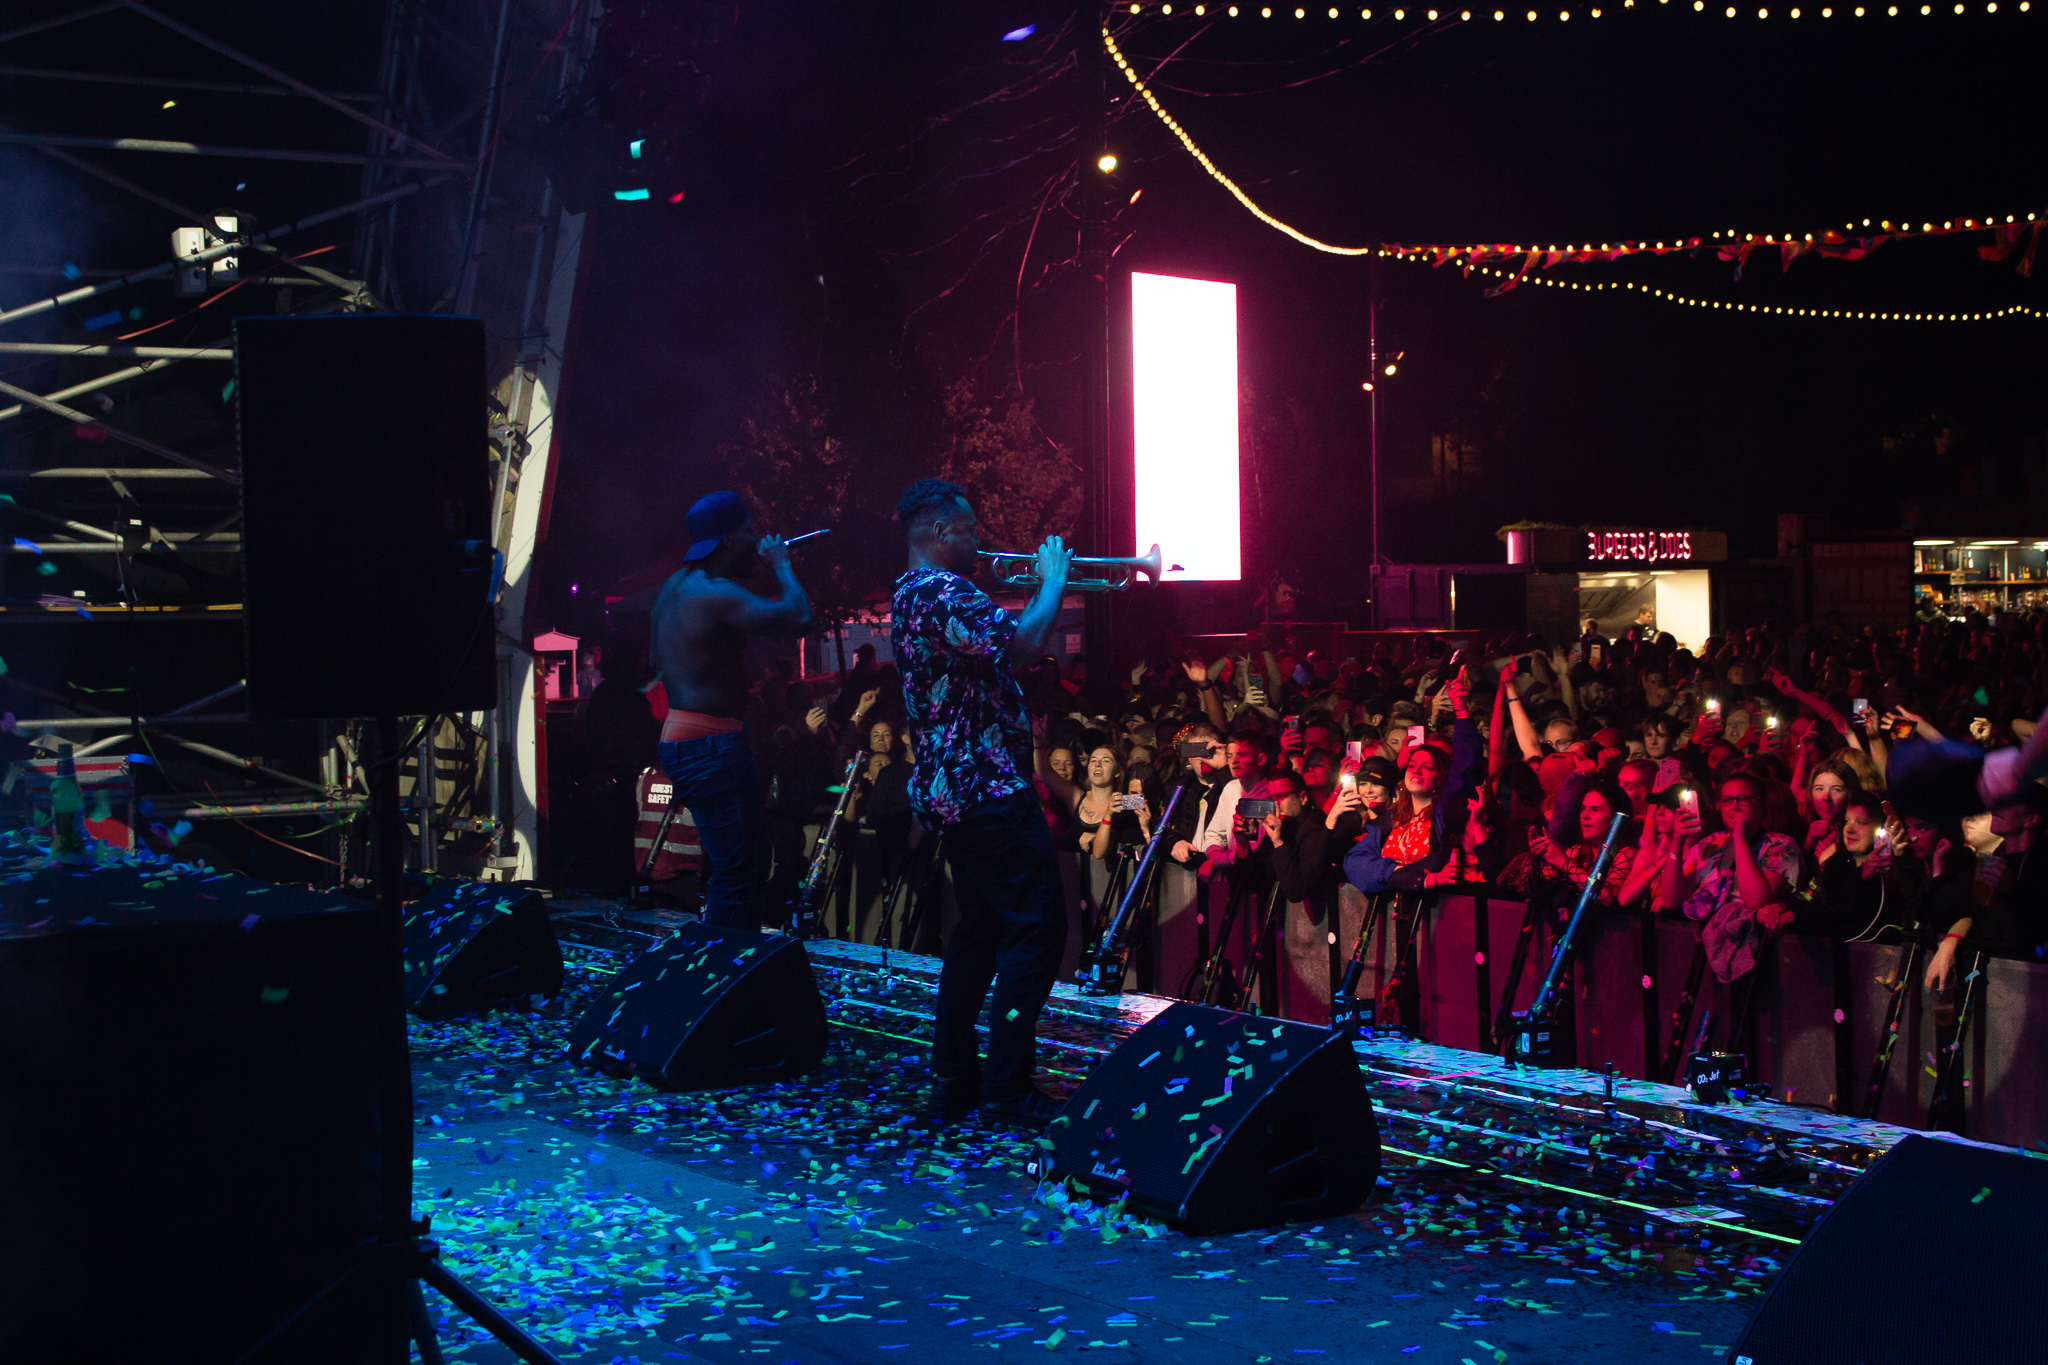 man playing sax in confetti